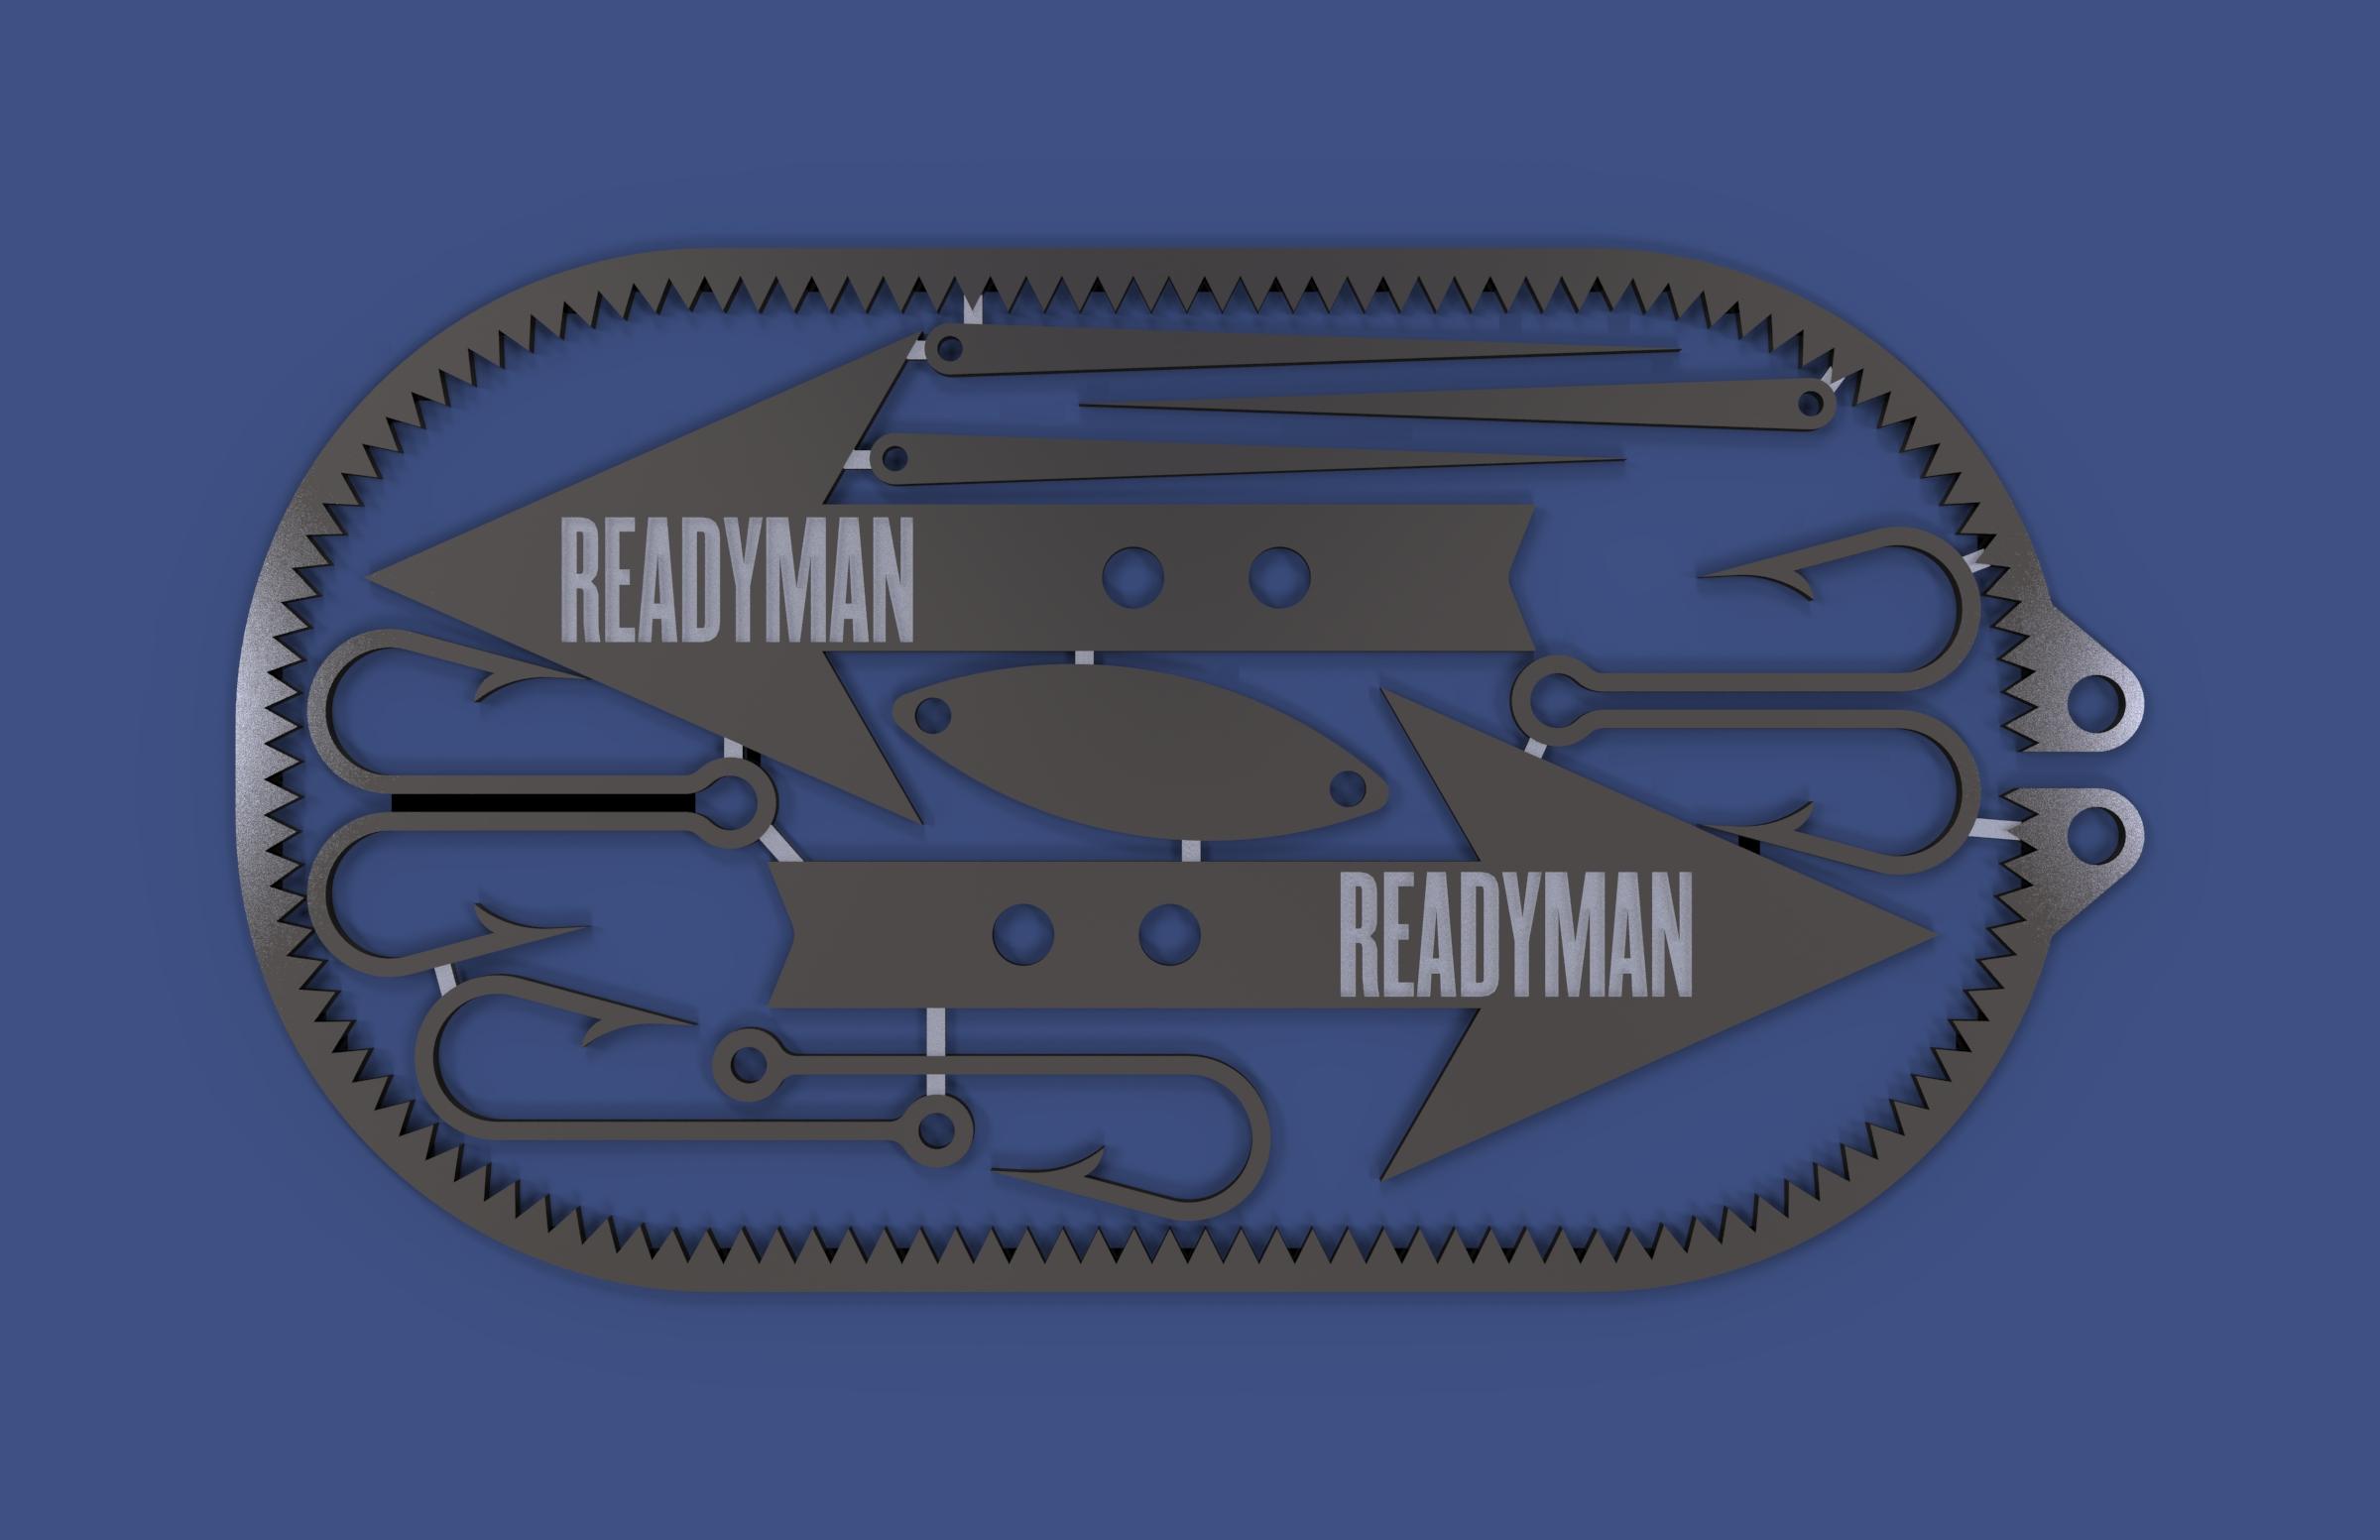 Readyman Dog tag Tool